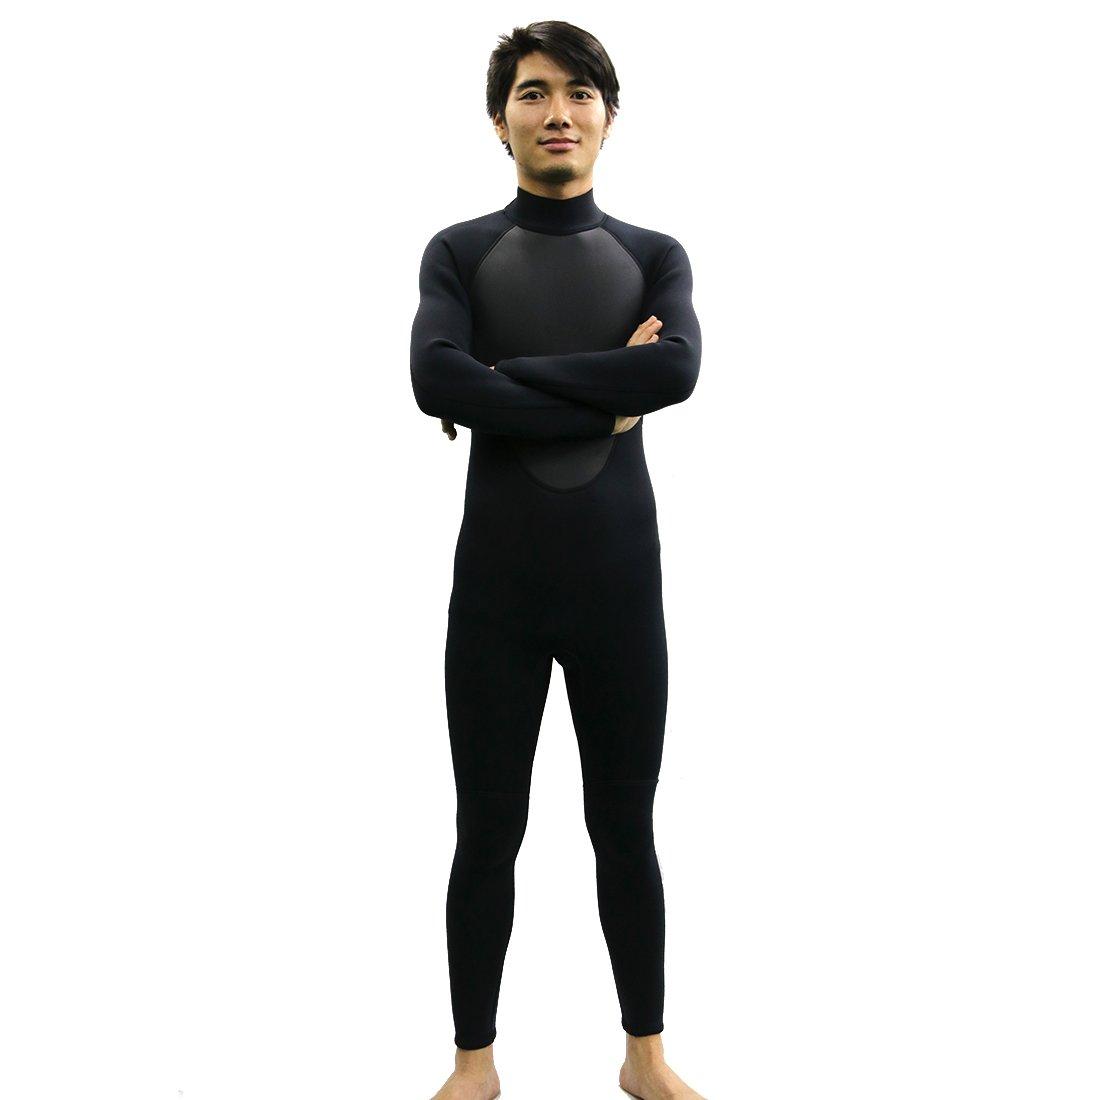 GoldFin Mens Wetsuit Full Body Diving Suit- 3mm Neoprene Surfing Wetsuit Back Zip Long Sleeve for Diving Surfing Snorkeling SW013 (Black, S) by GoldFin